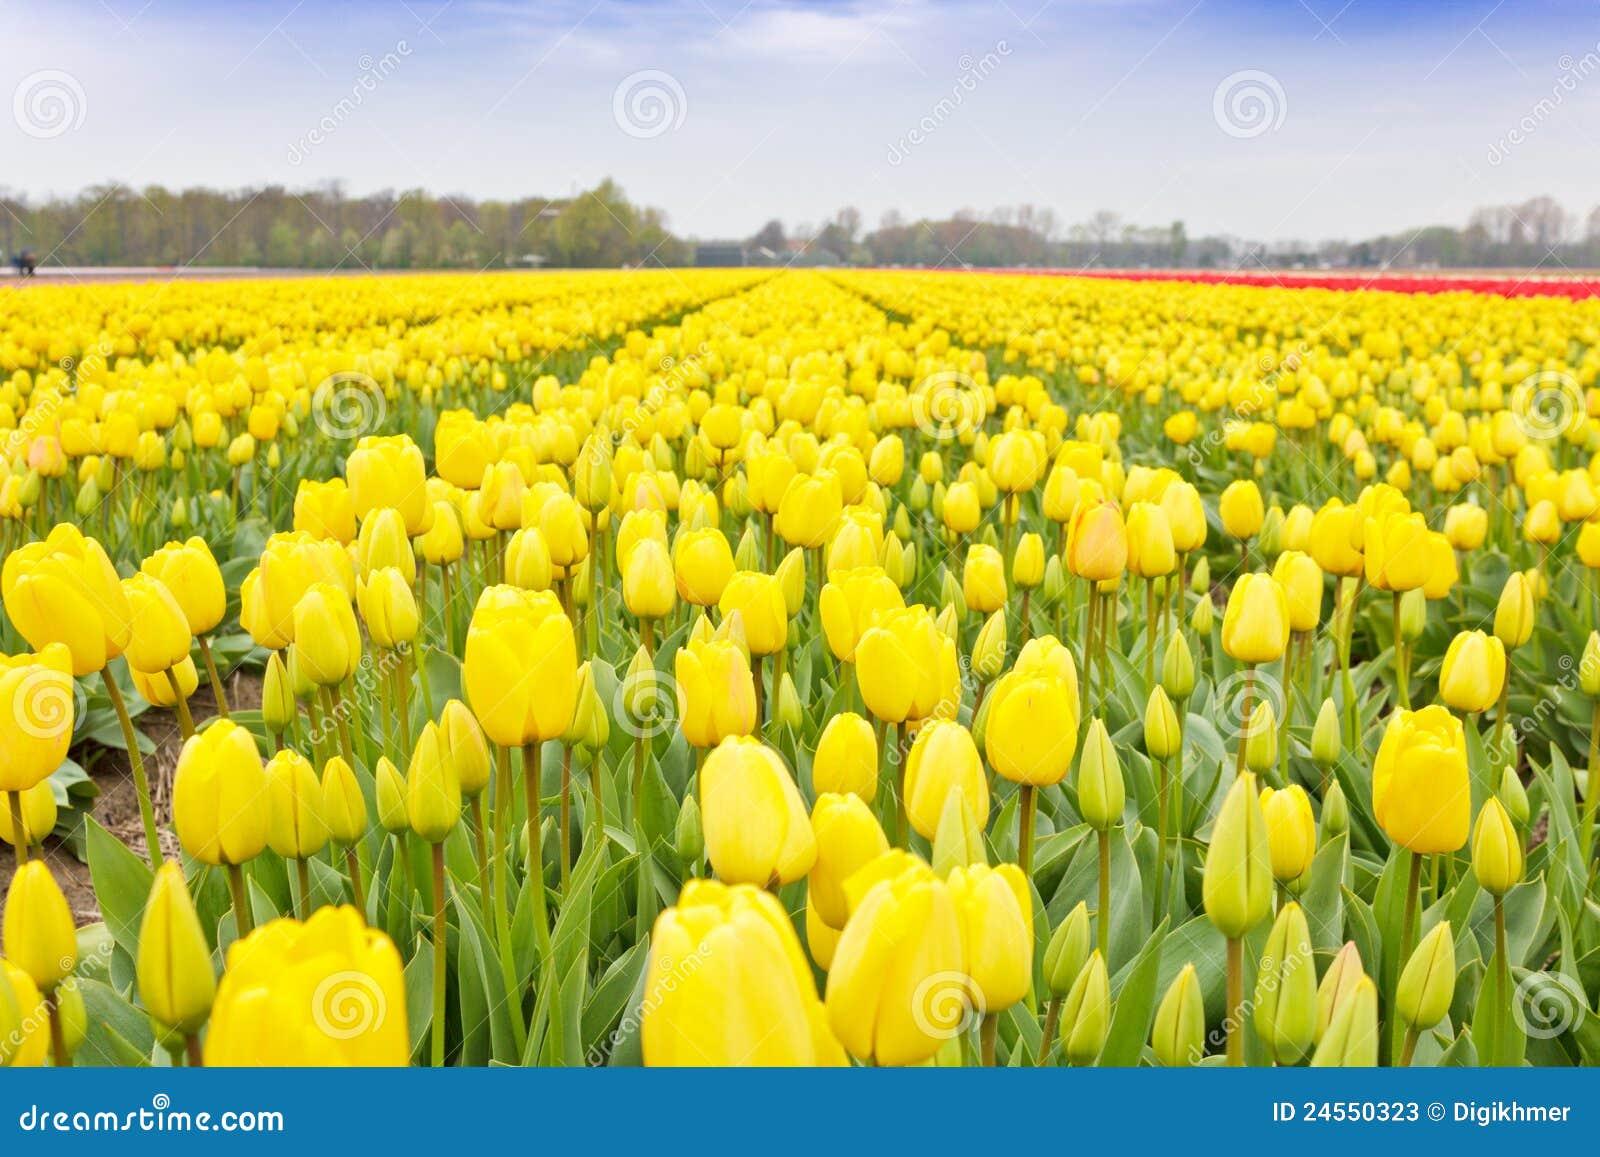 Yellow Tulips Bulb Field Stock Image Image Of Sunny 24550323